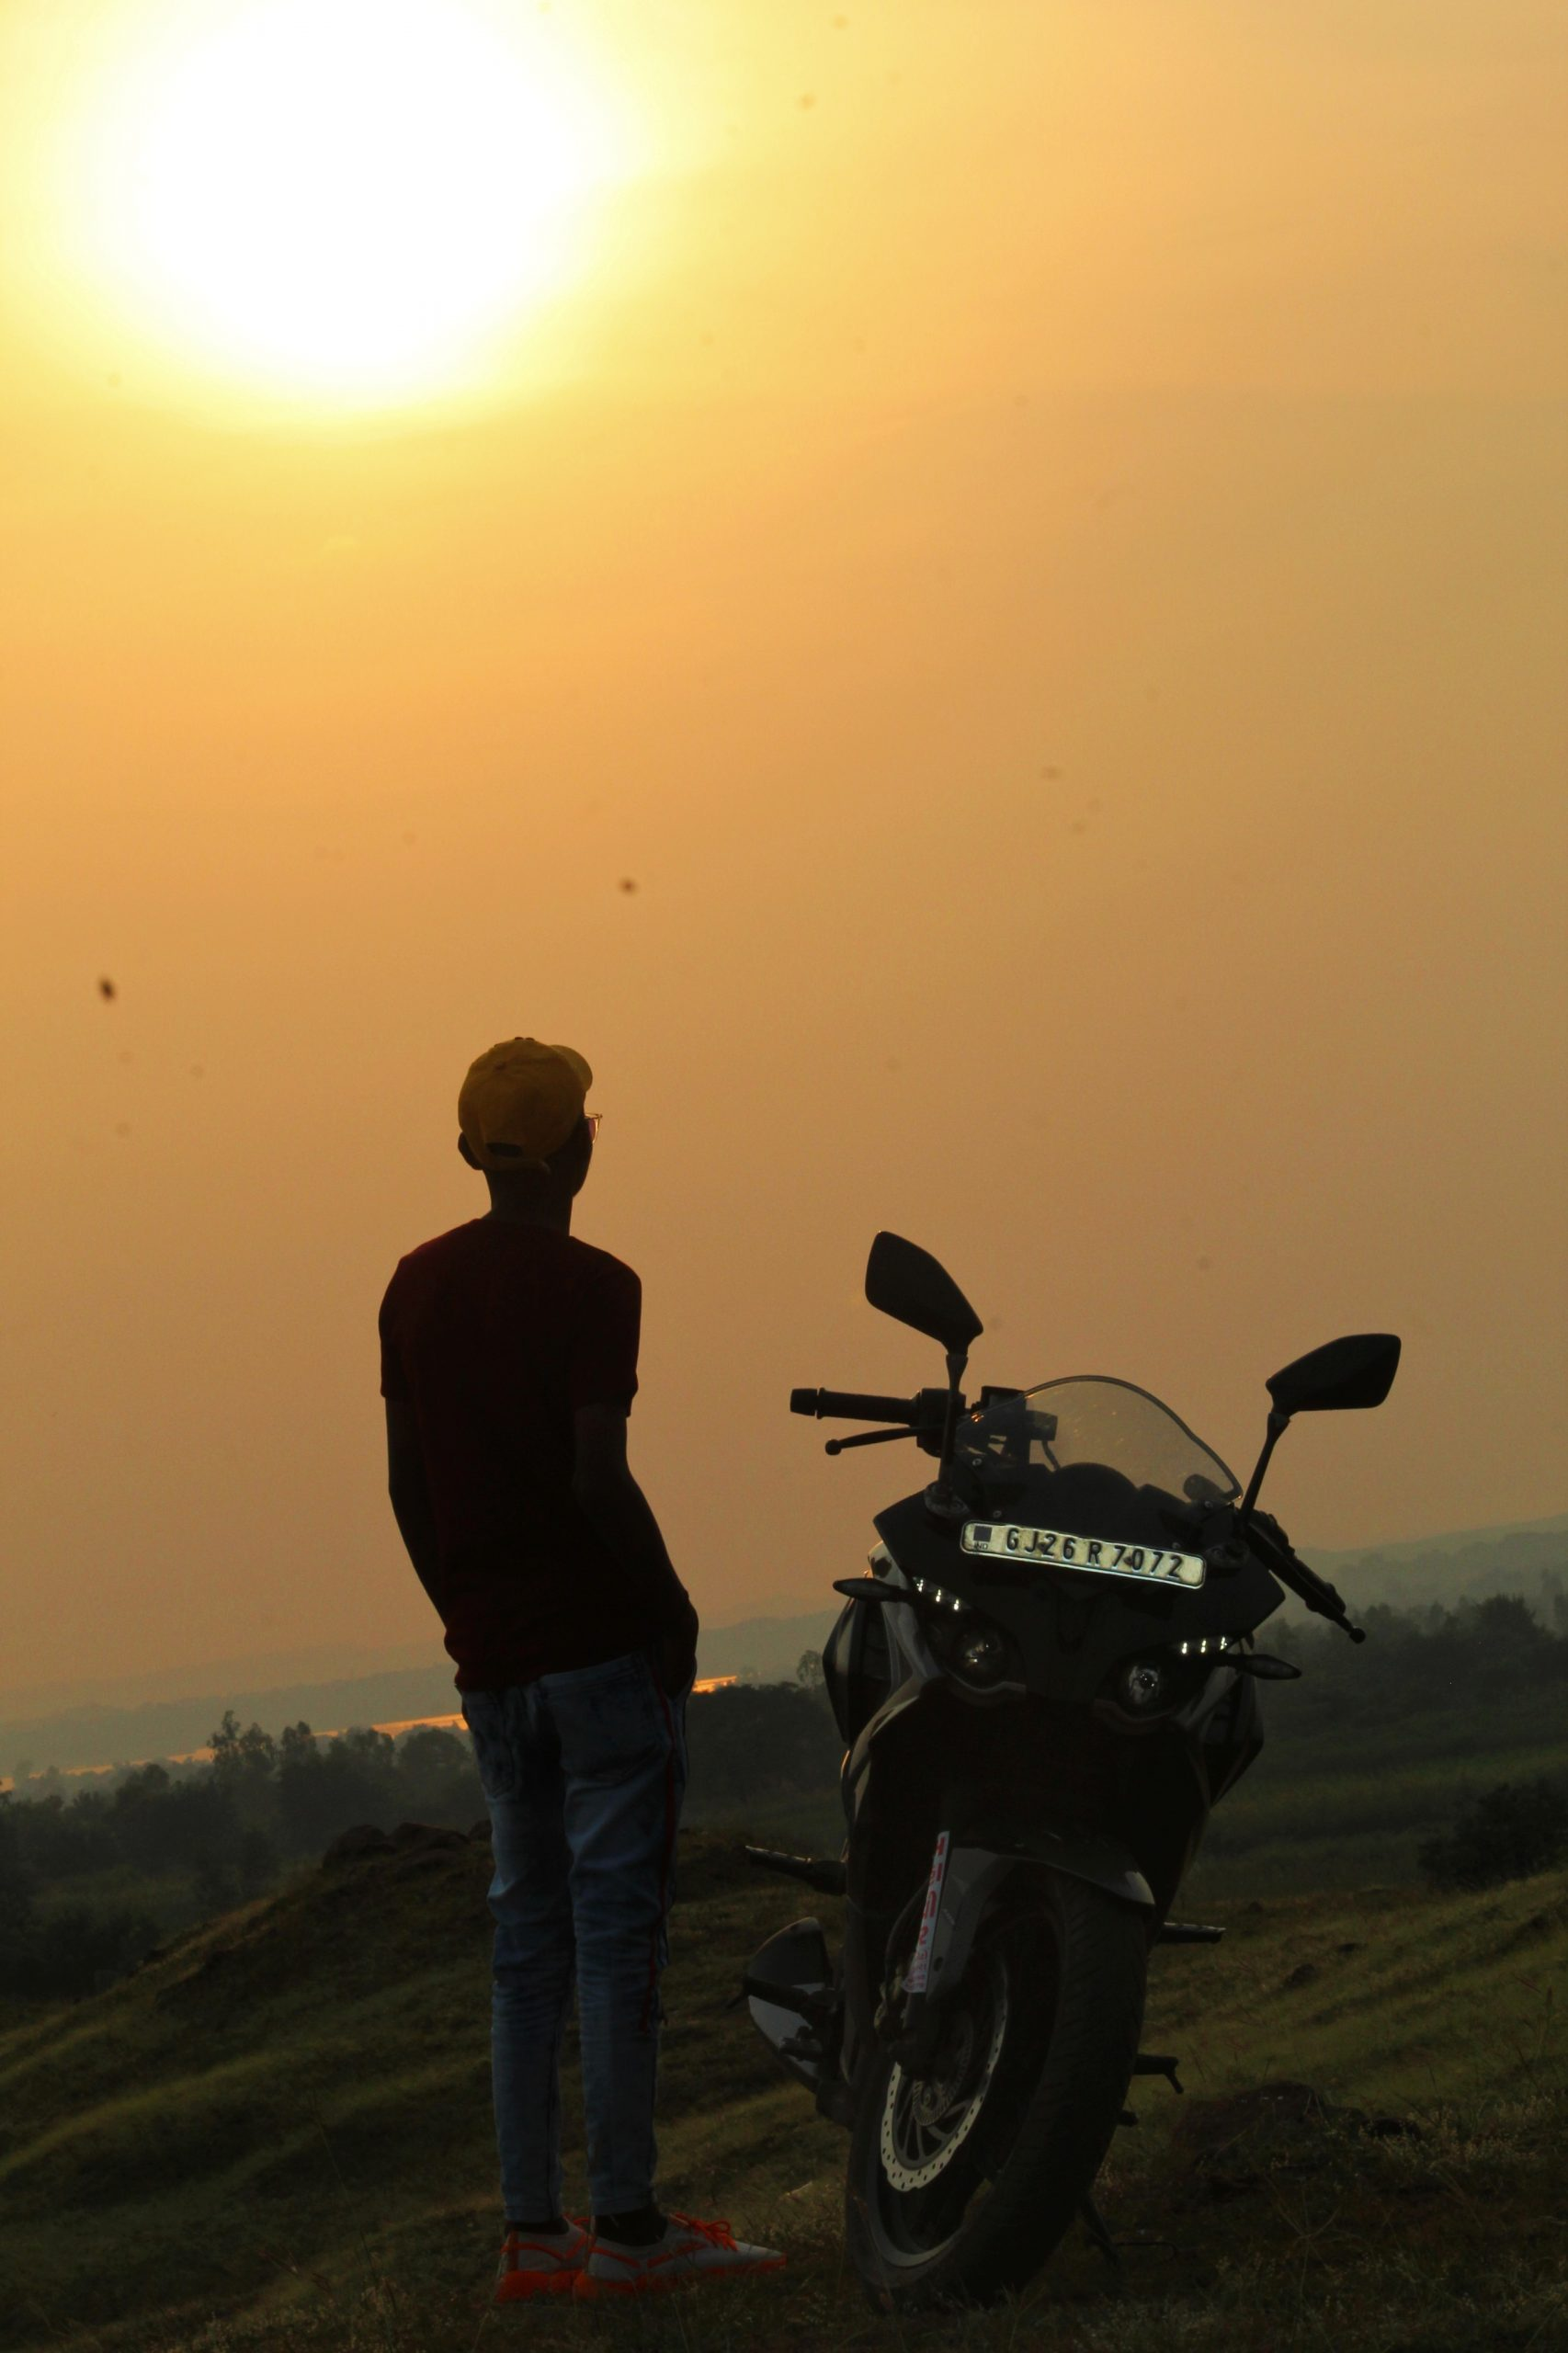 boy posing near a bike